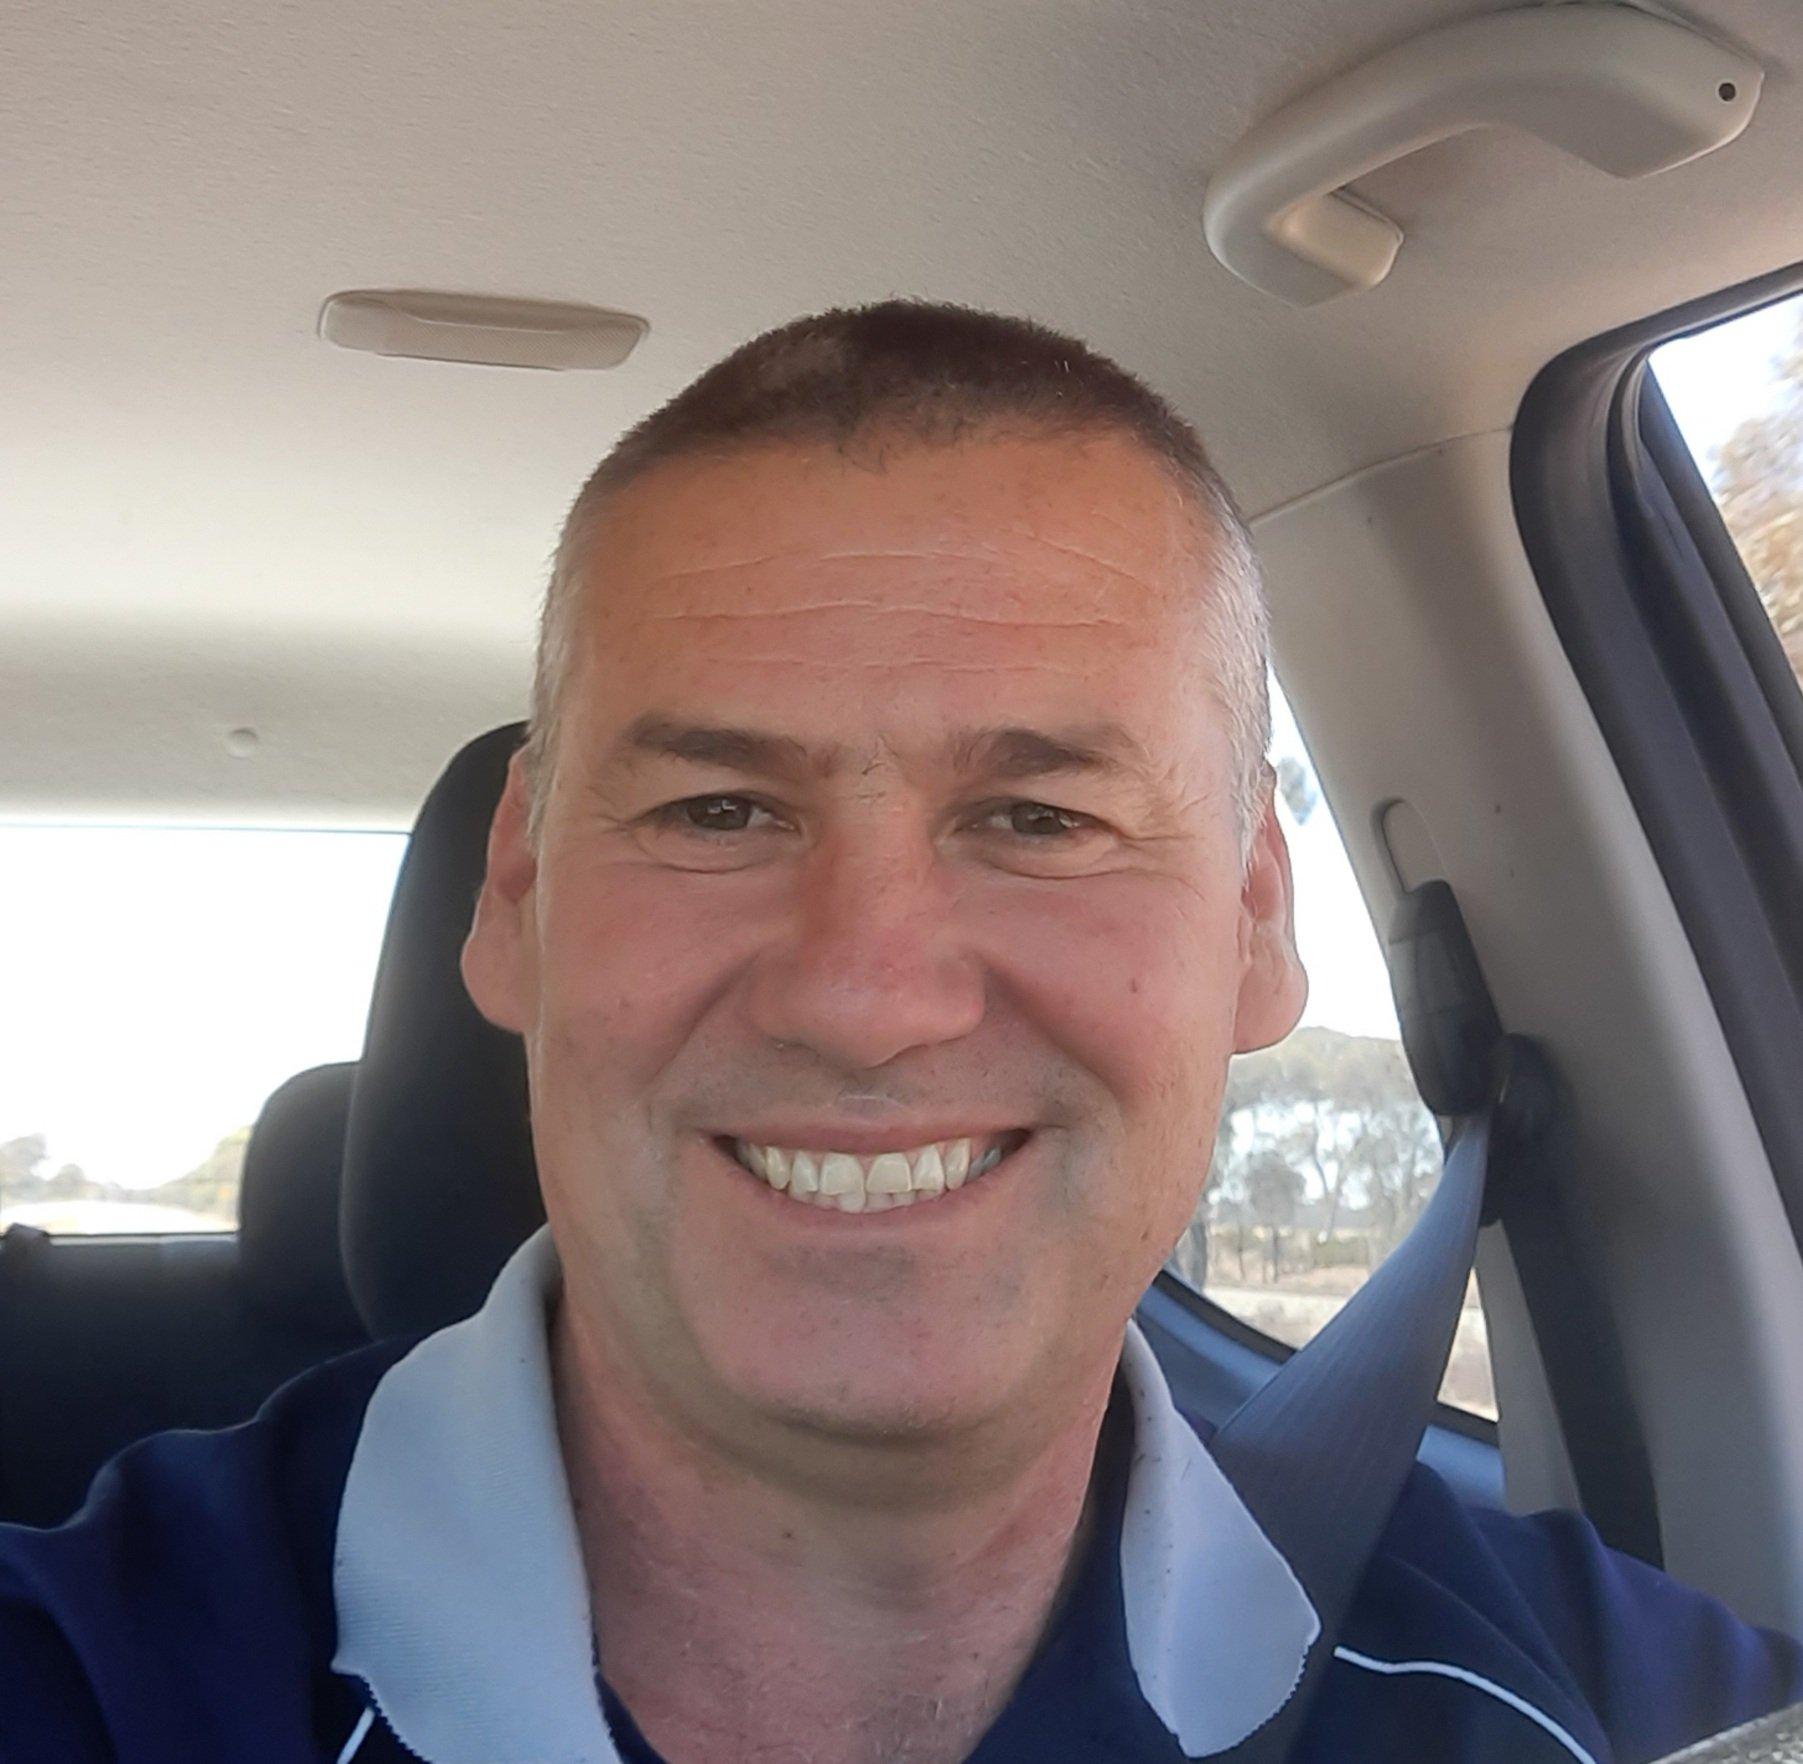 Hillsman  from Western Australia,Australia